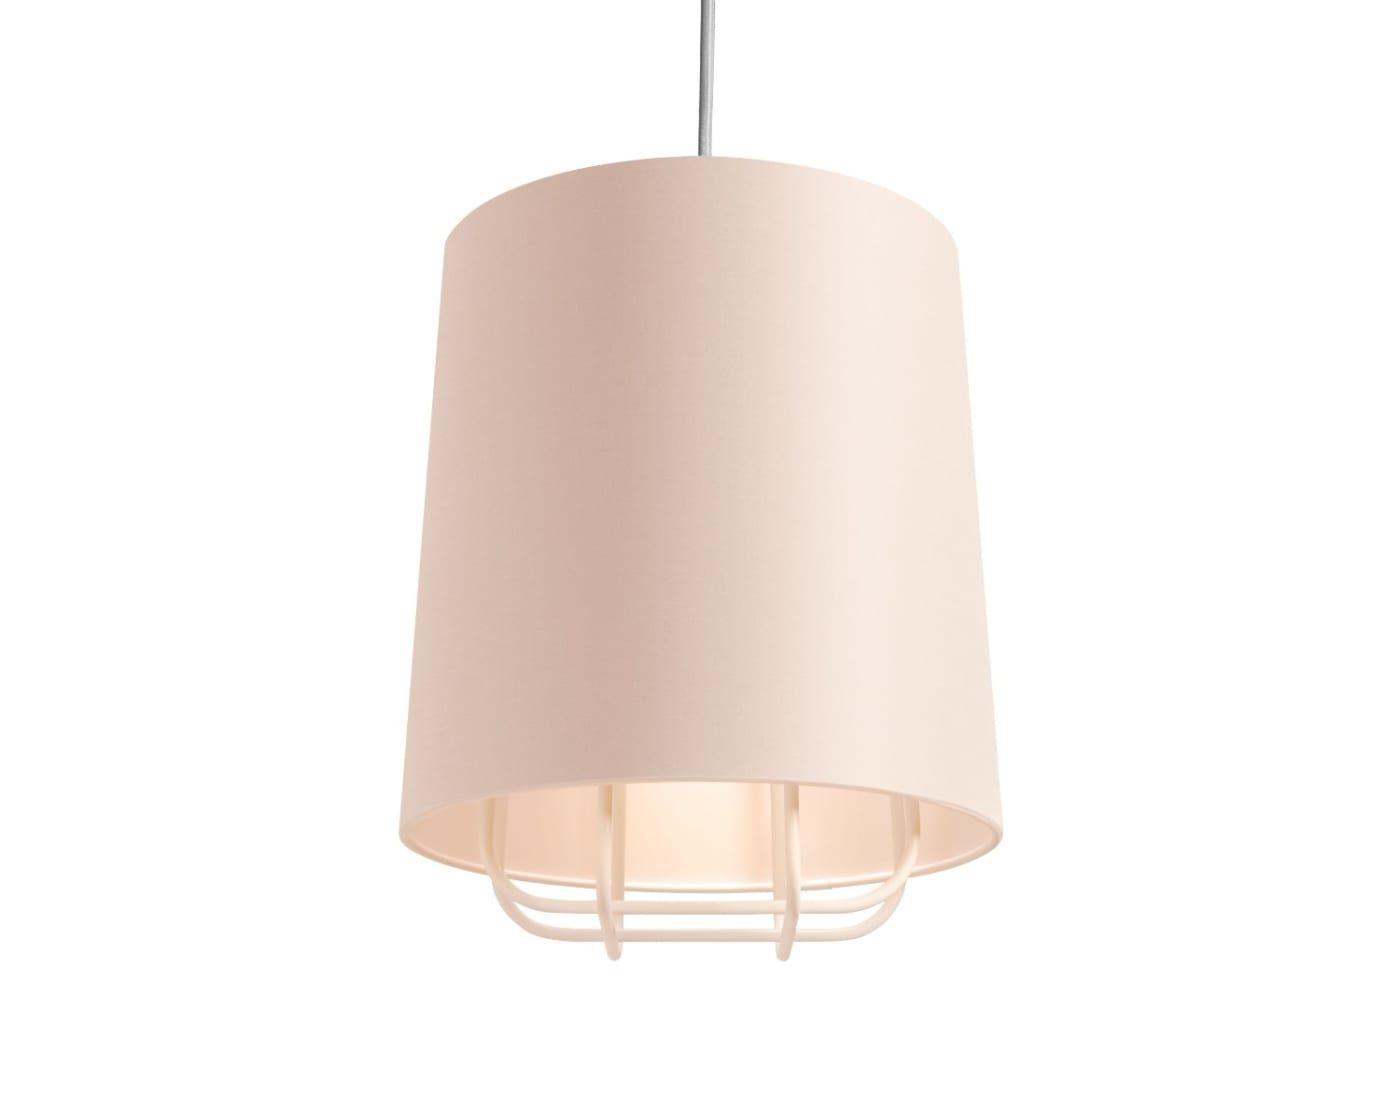 Perimeter Small Pendant Light In Blush Modern Lamps And Lights Blu Dot In 2020 Pendant Light Small Pendant Lights Small Pendant